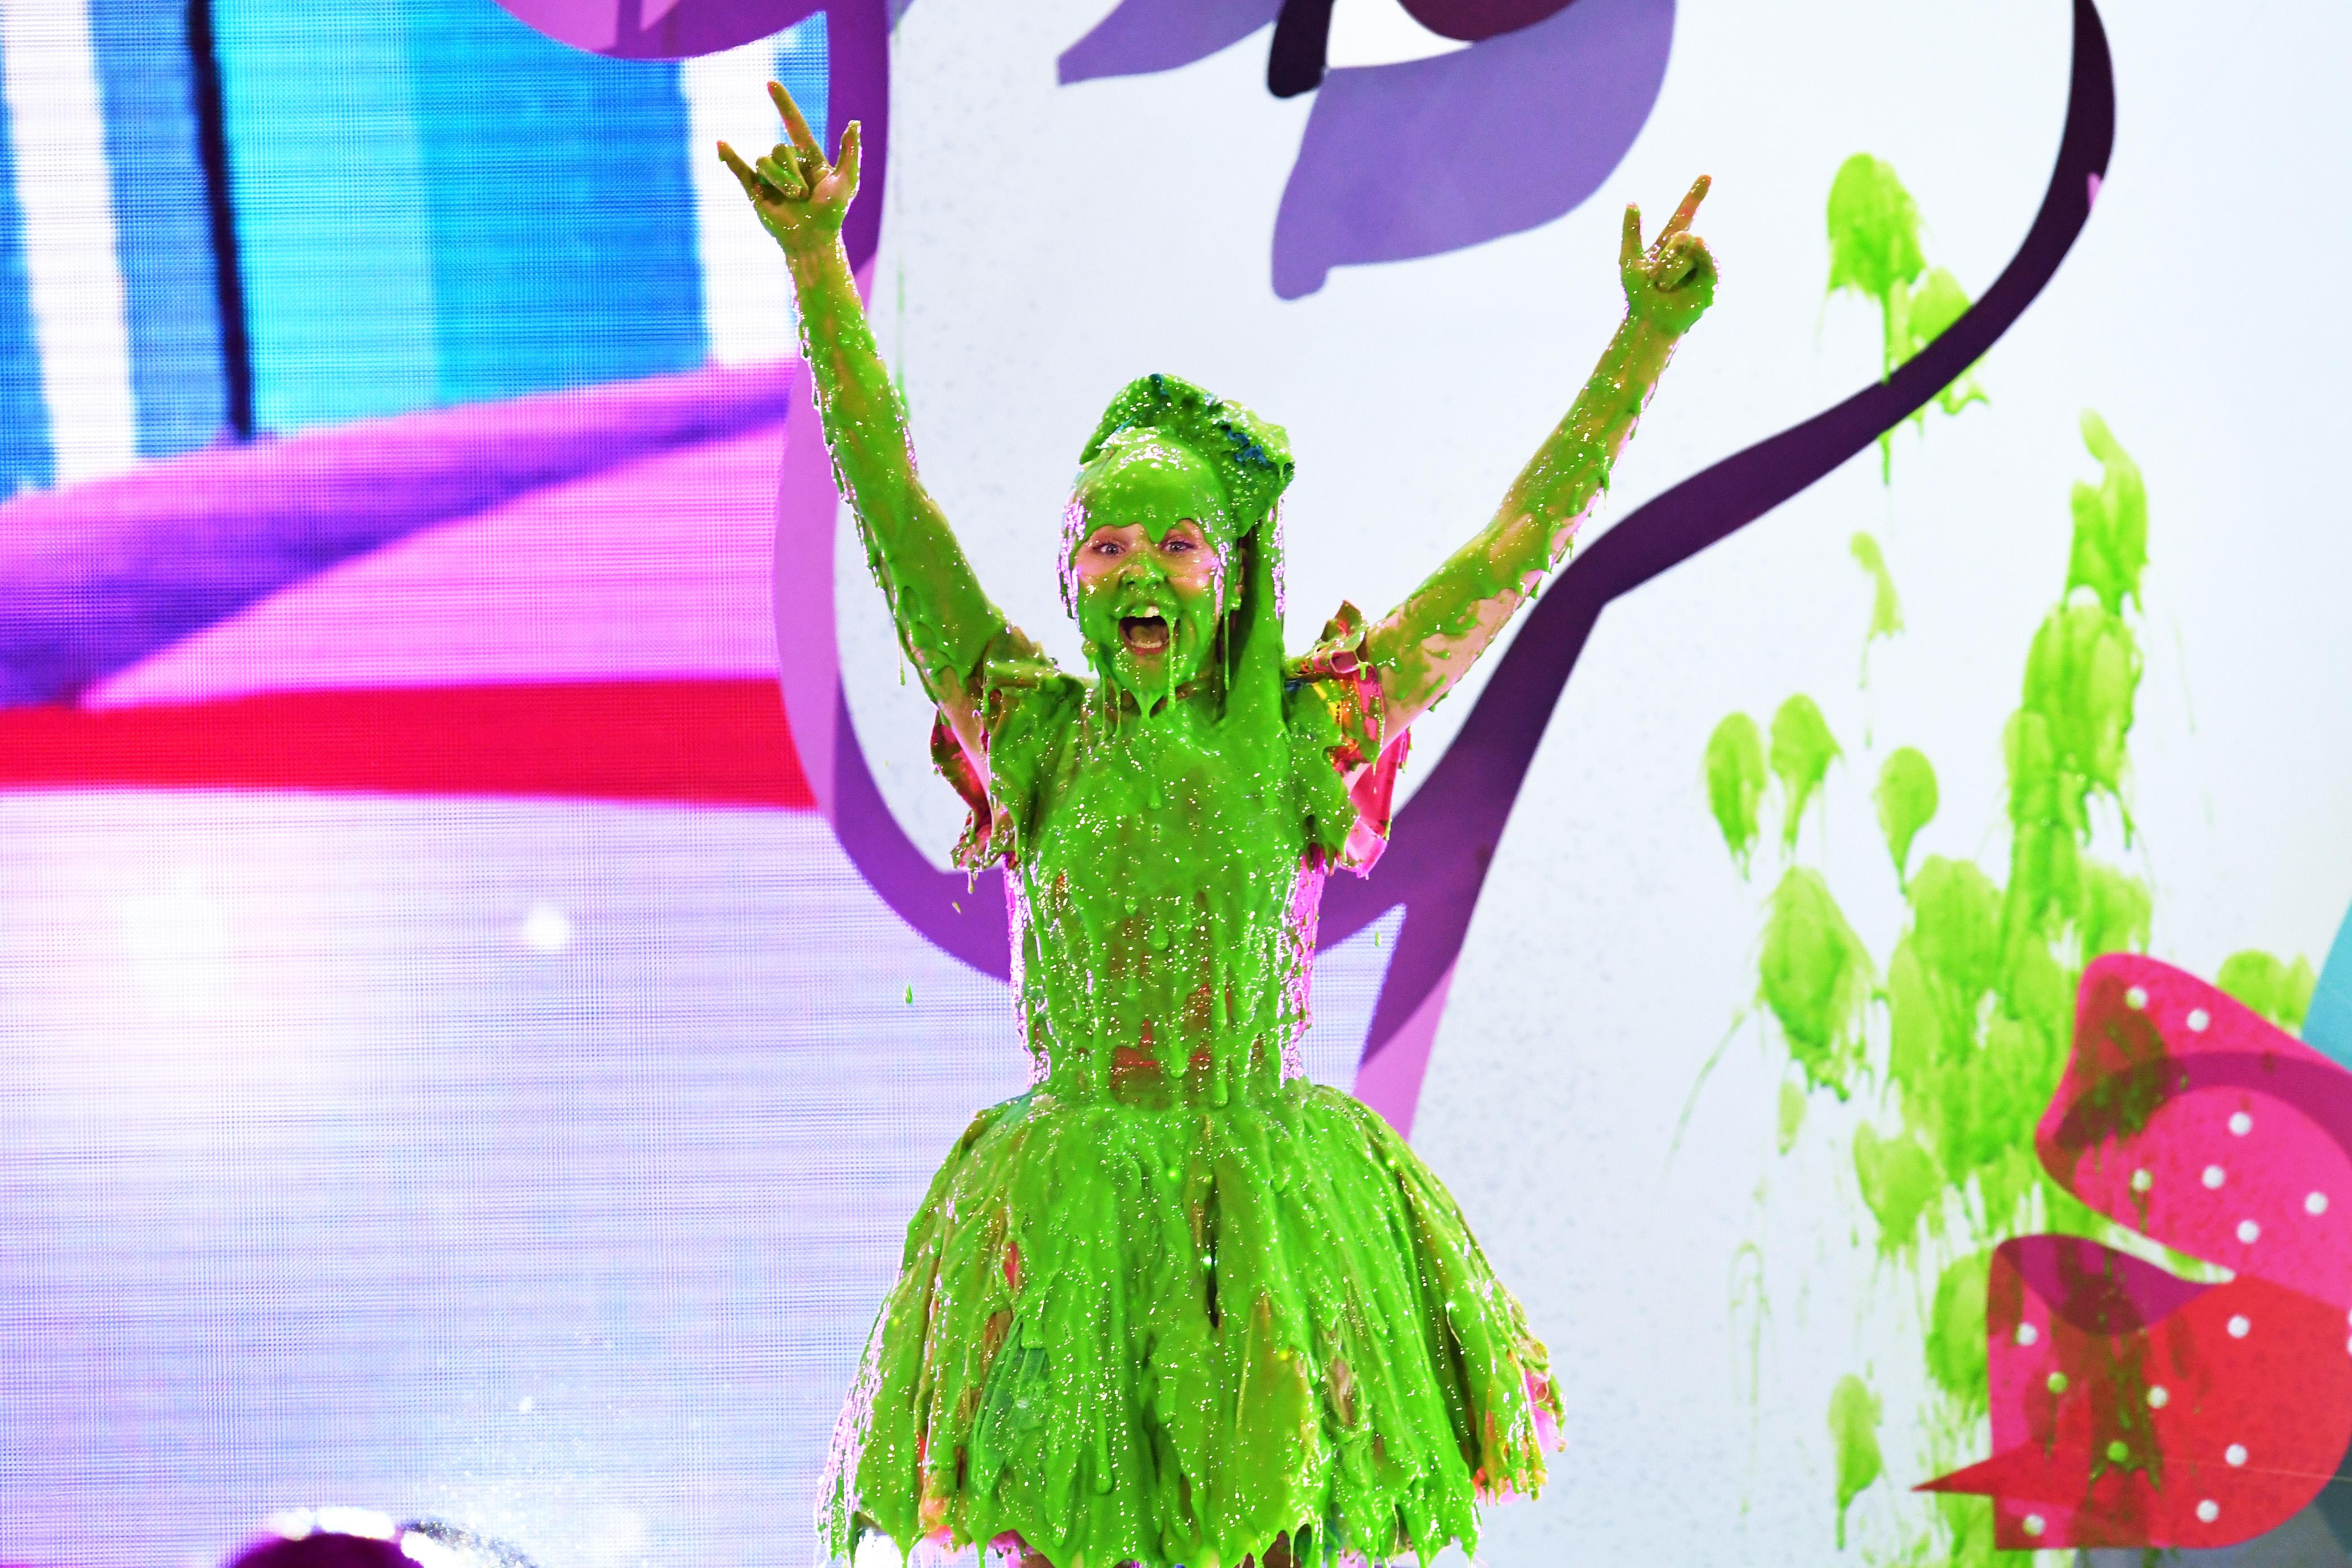 Heidi-Klum-John-Cena-Mel-B-JoJo-Siwa-And-More-Stars-Get-Slimed-At-The-2018-Kids-Choice-Awards